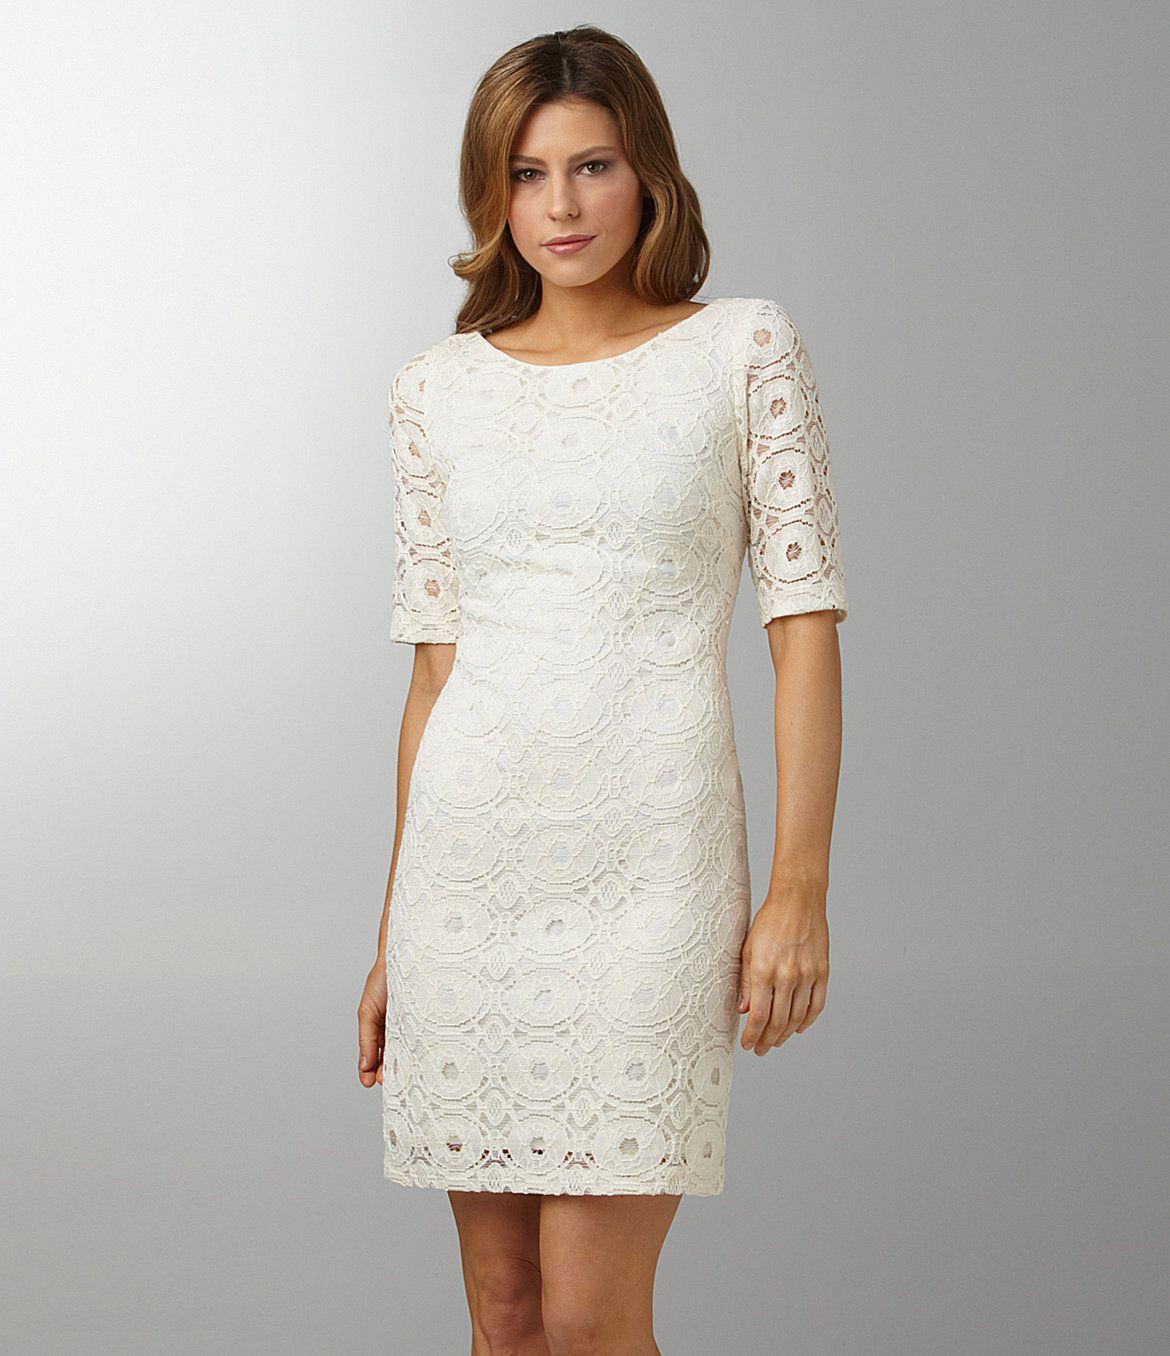 LOVE this Lace Dress! | My Style | Pinterest | Lace sheath dress ...